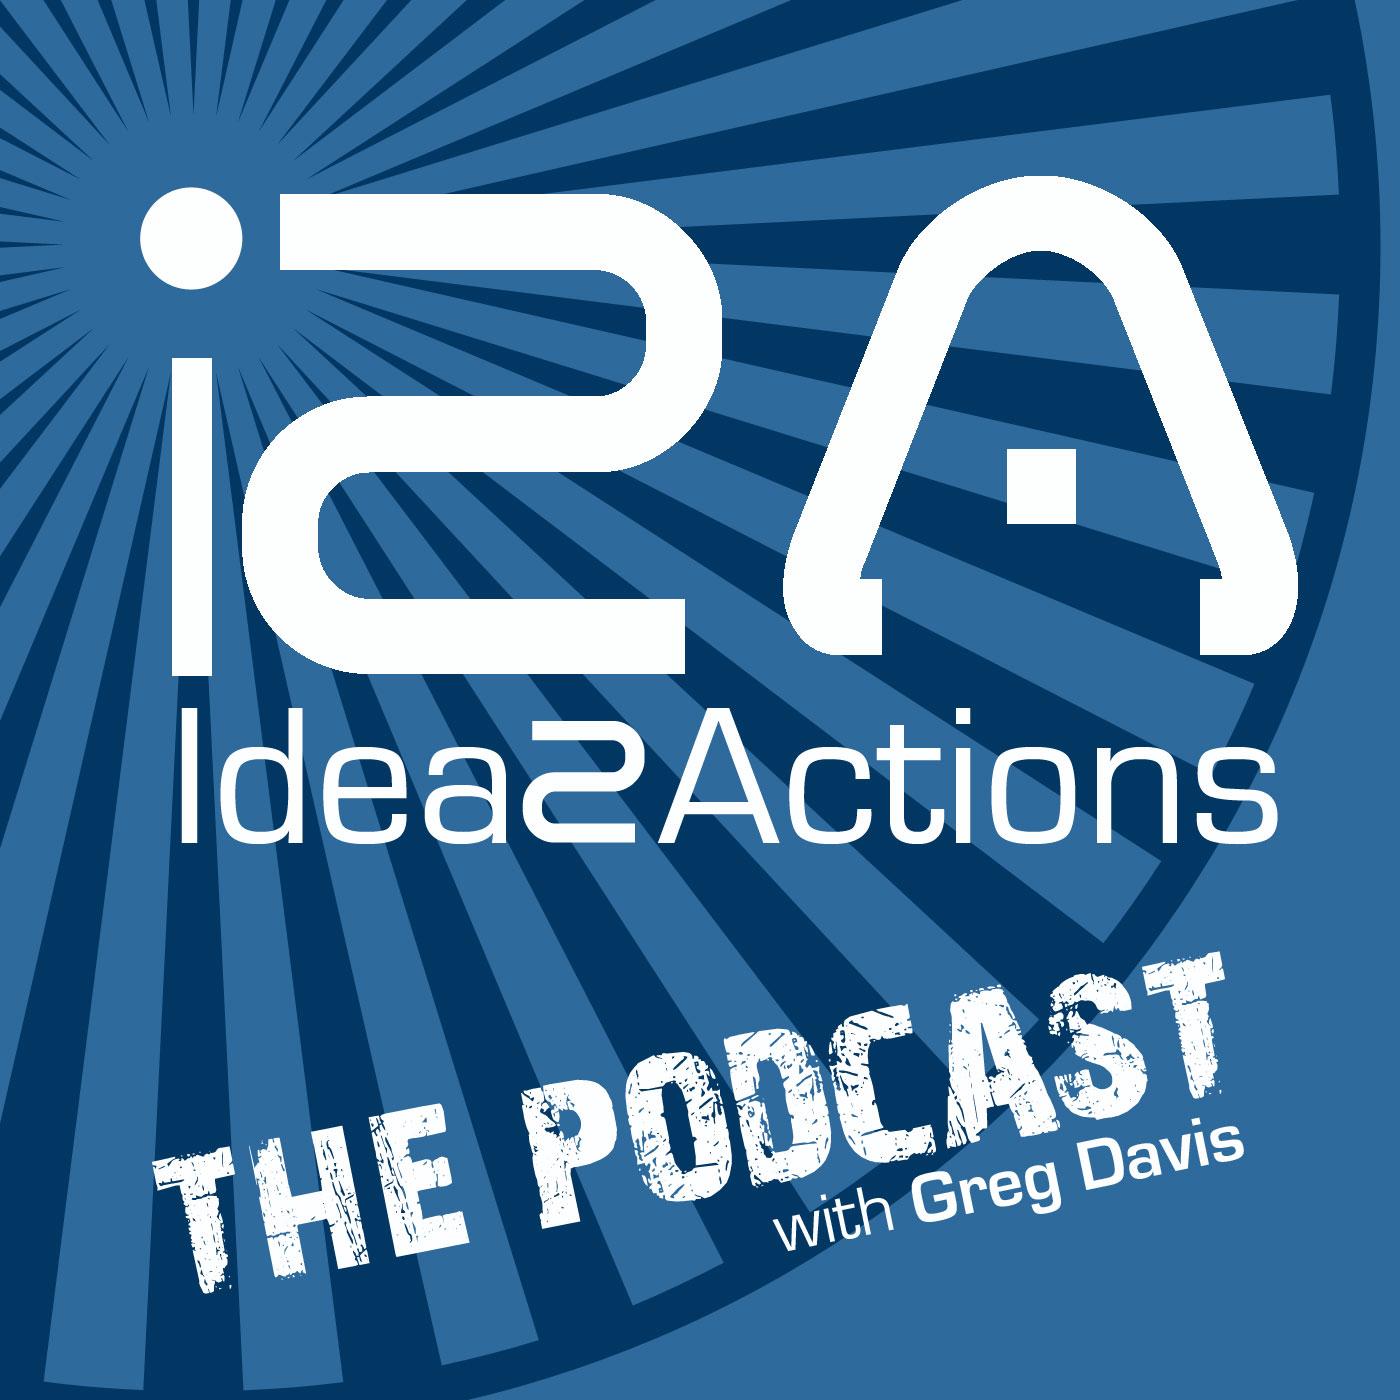 Idea2Actions formerly Rhythm of Profitability | i2A Creative Marketing Strategies